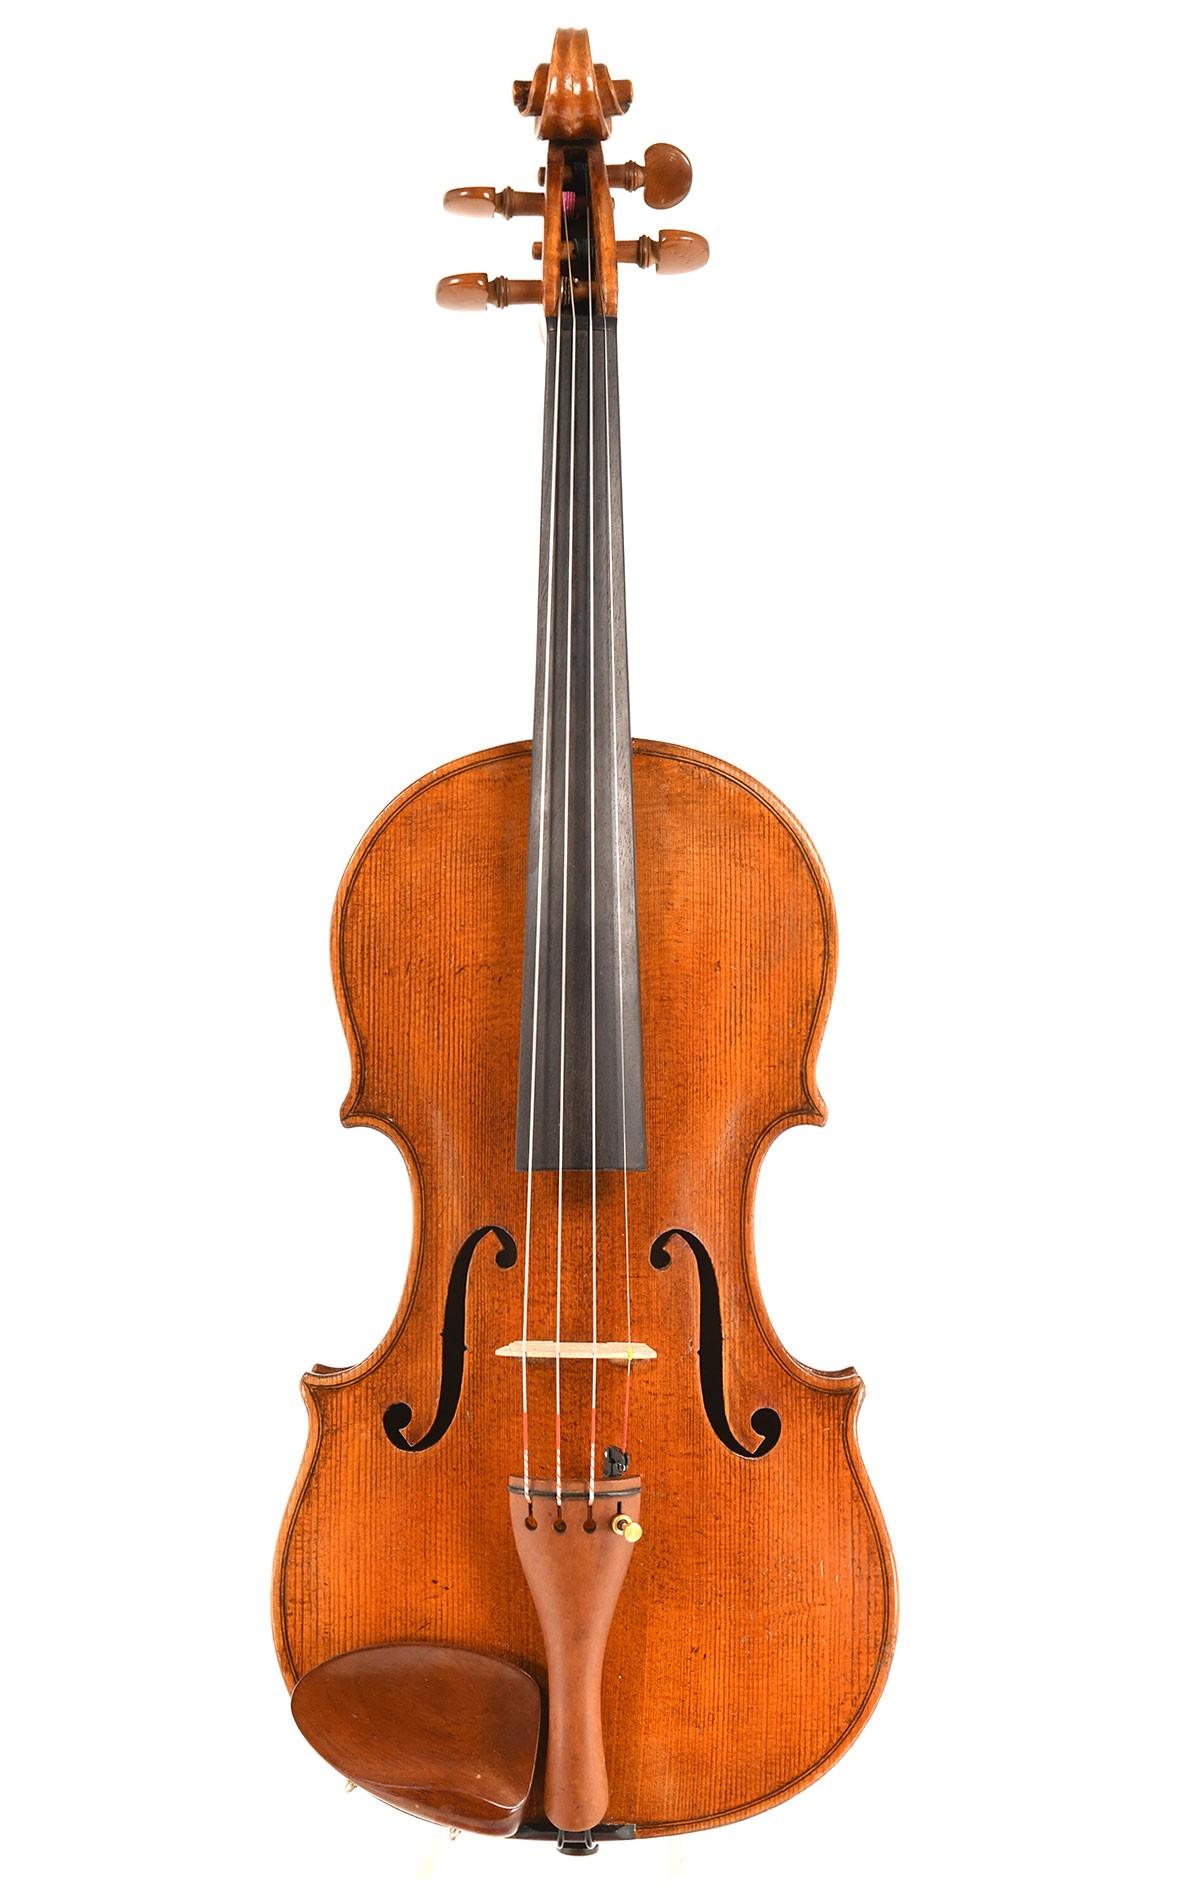 Old Saxon violin after J. B. Schweitzer